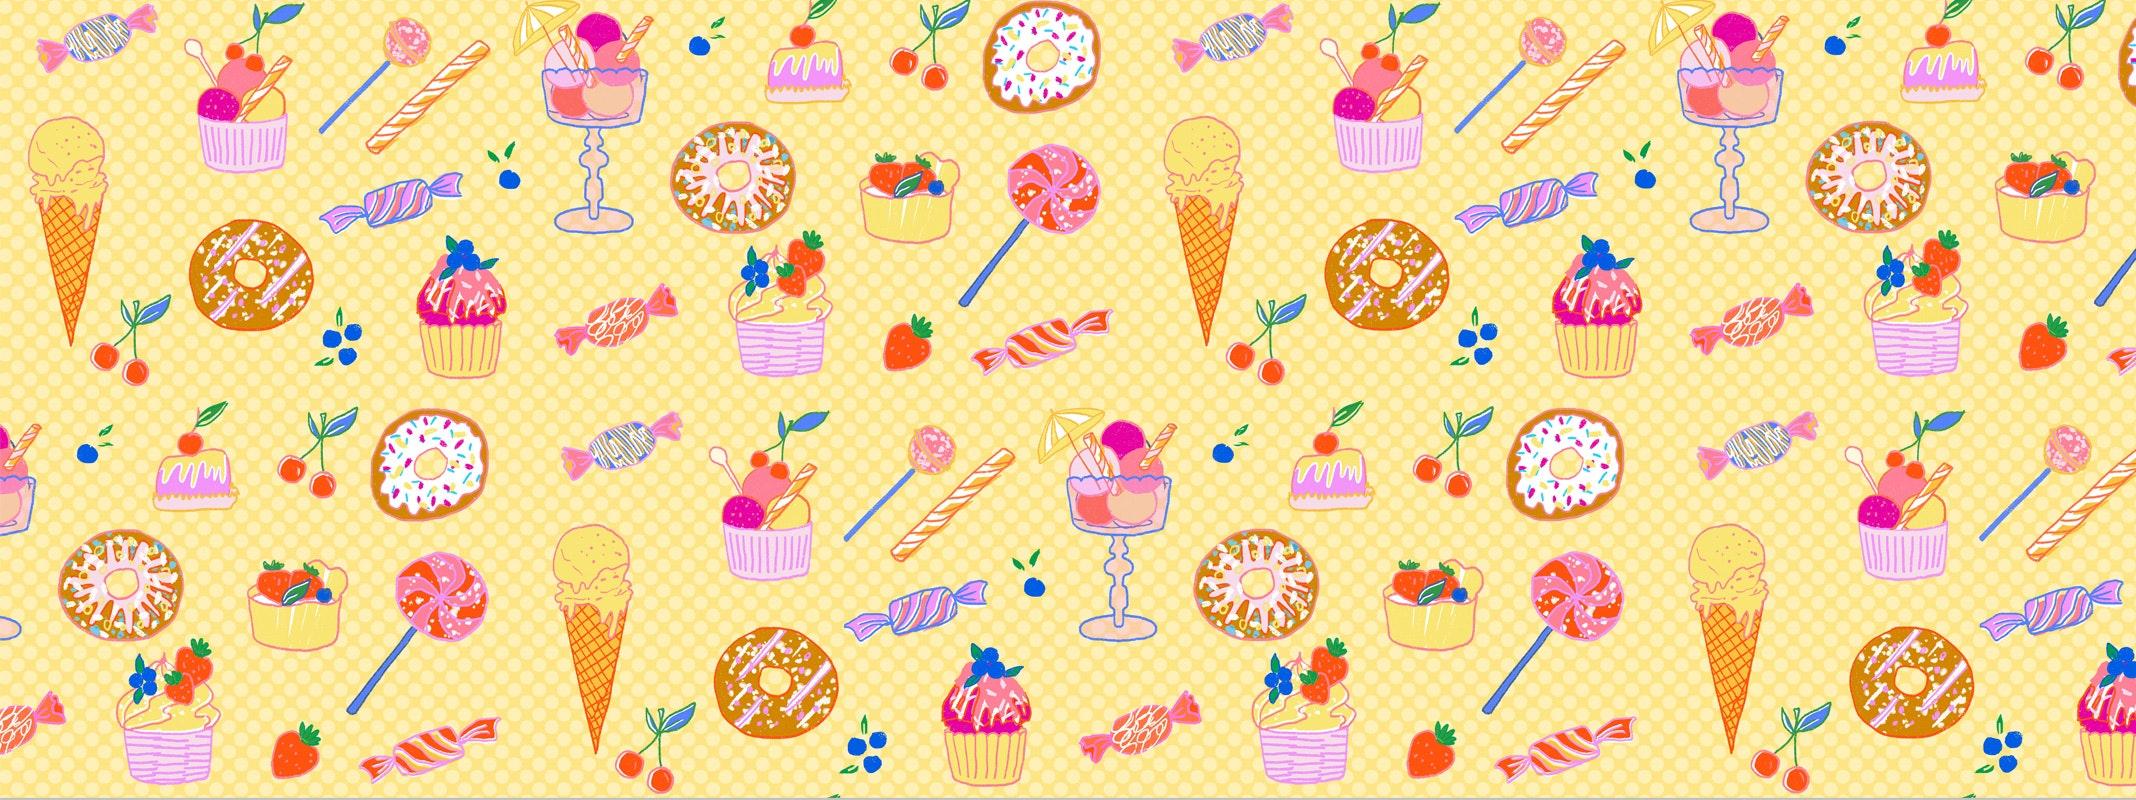 MILICA GOLUBOVIC - Milica_Golubovic_Sweets-pattern-web